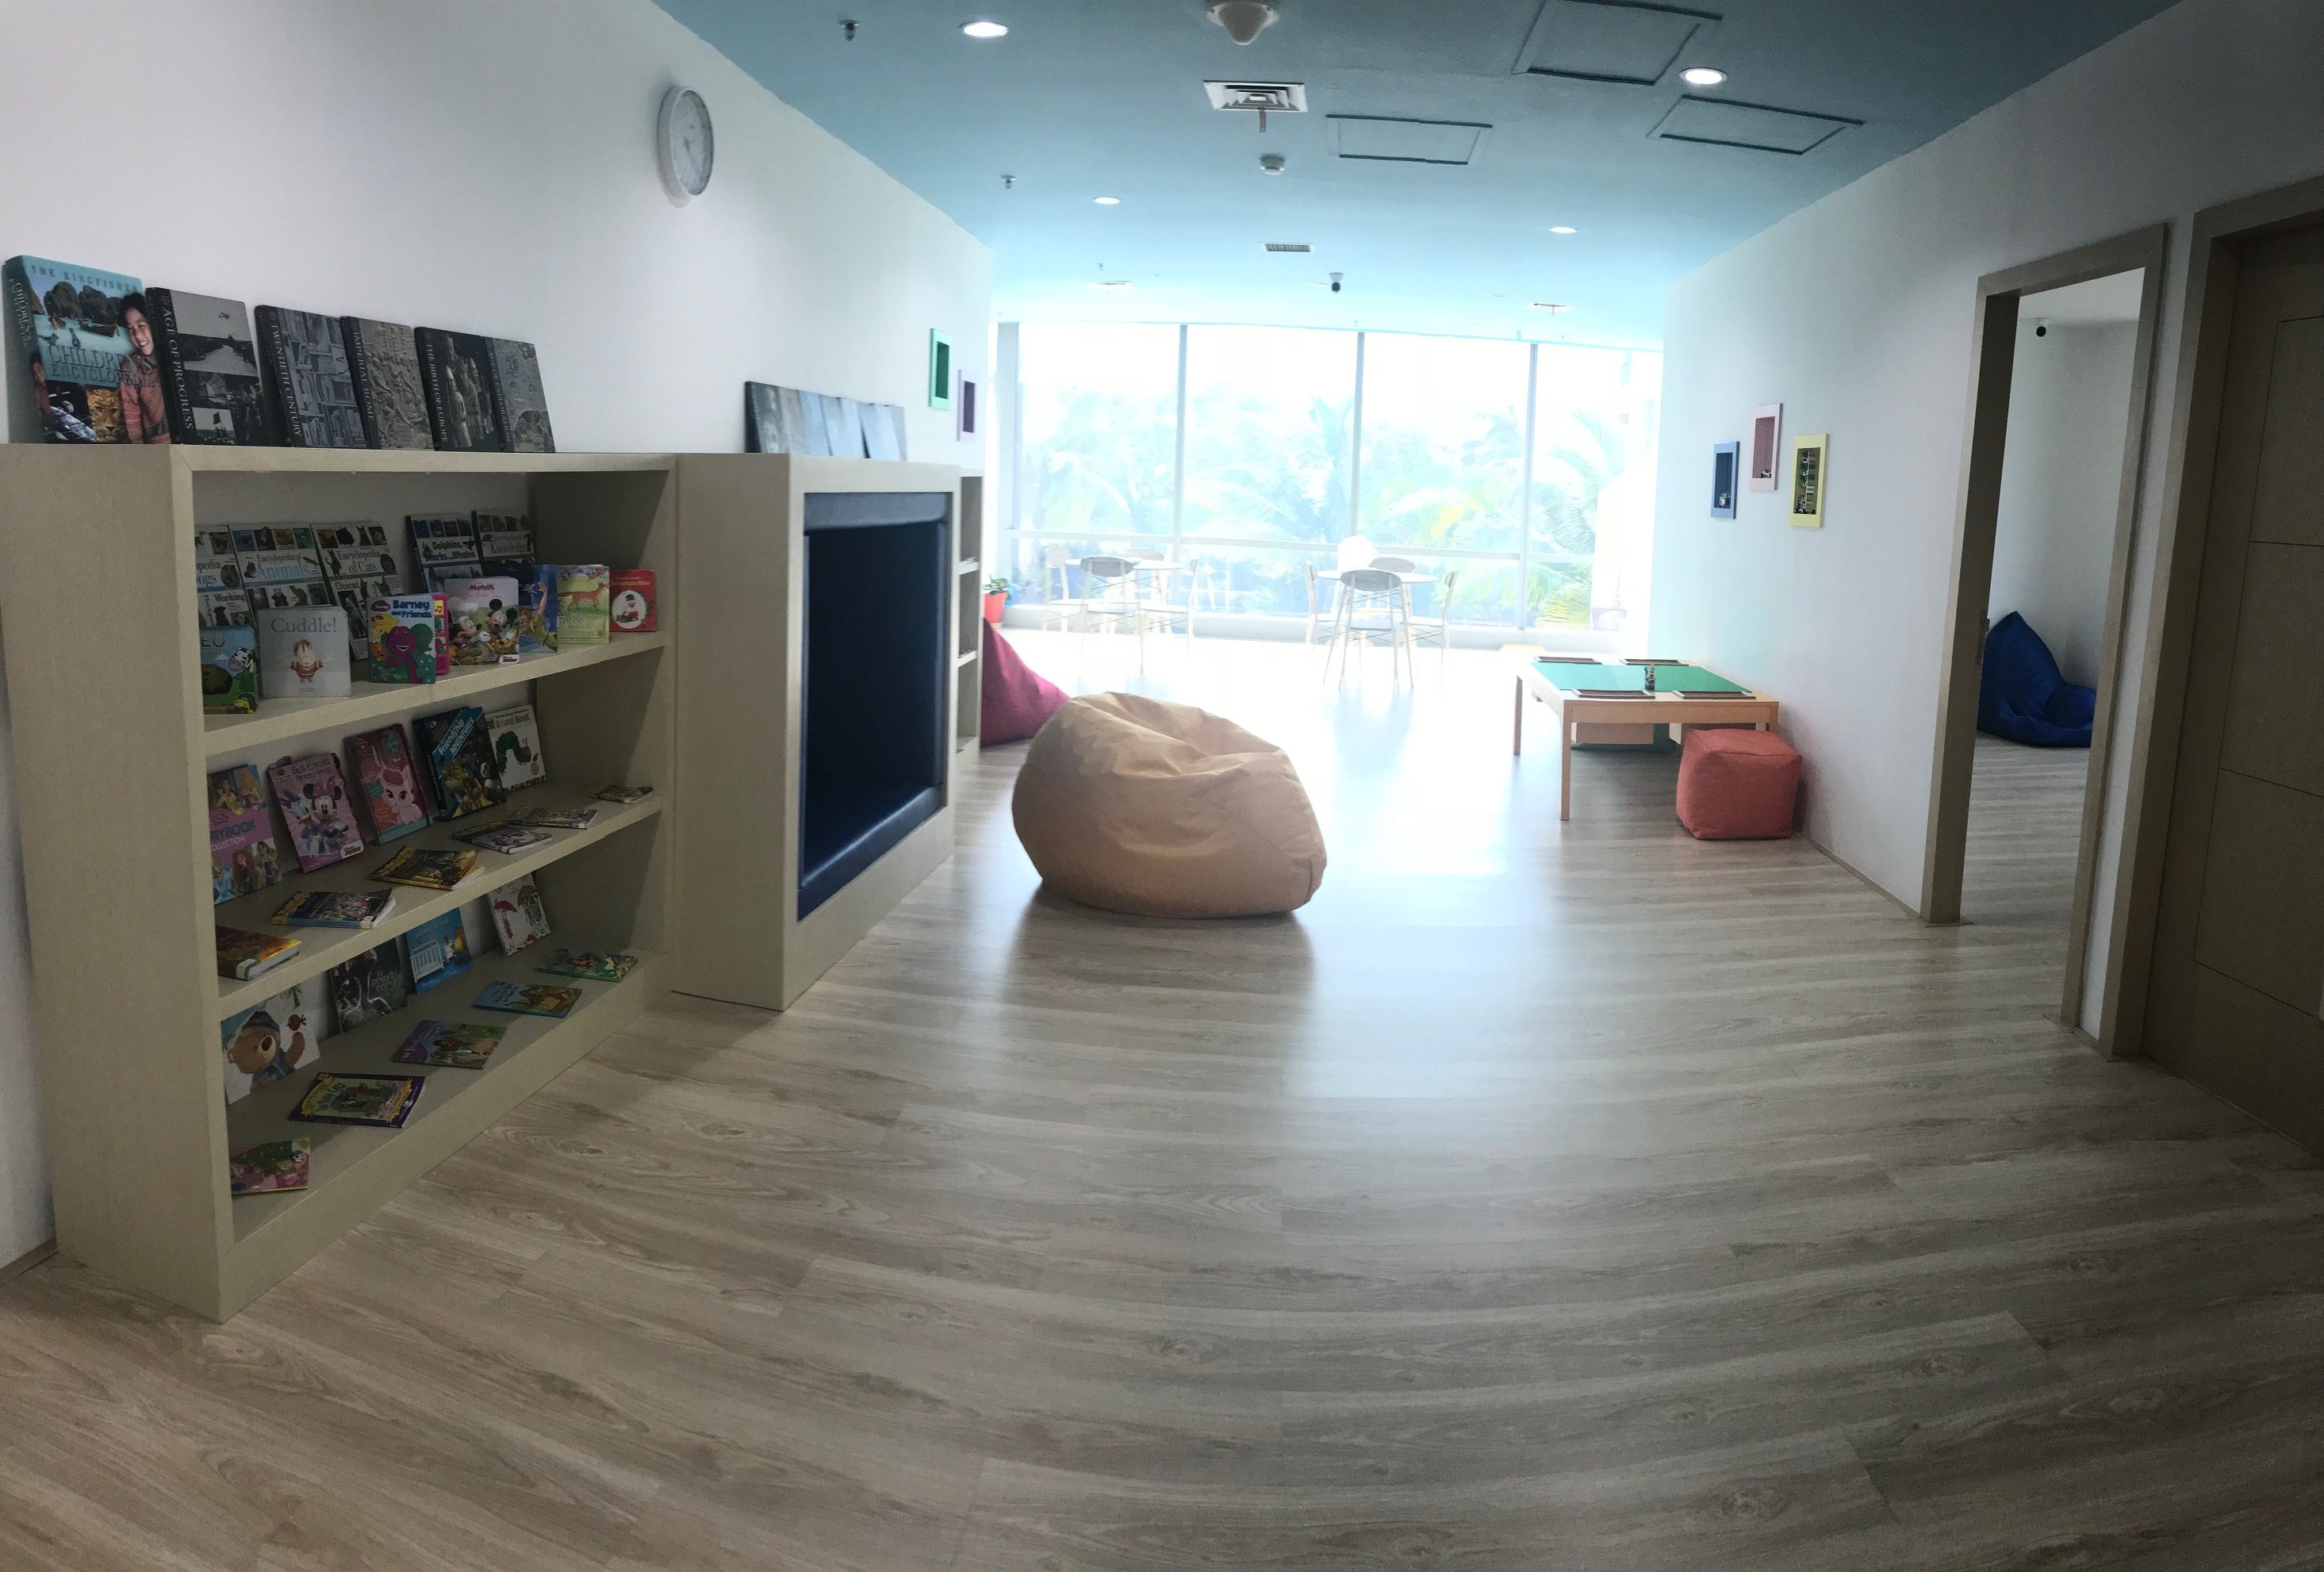 Main Hall - Library